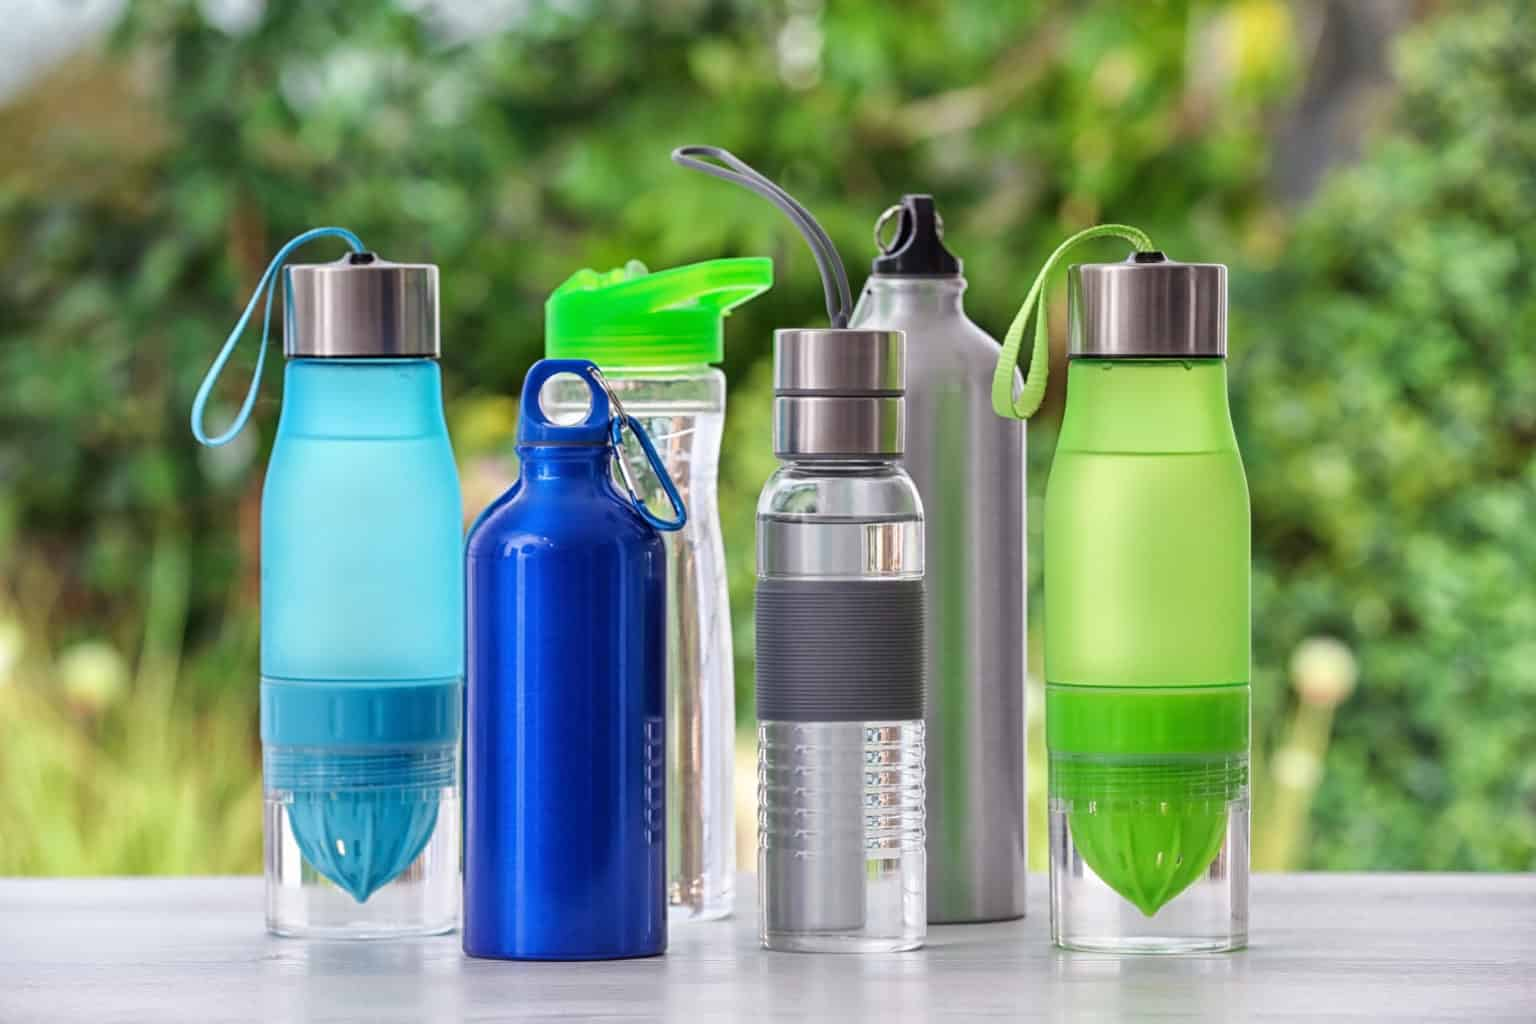 Hydro Flask Alternatives